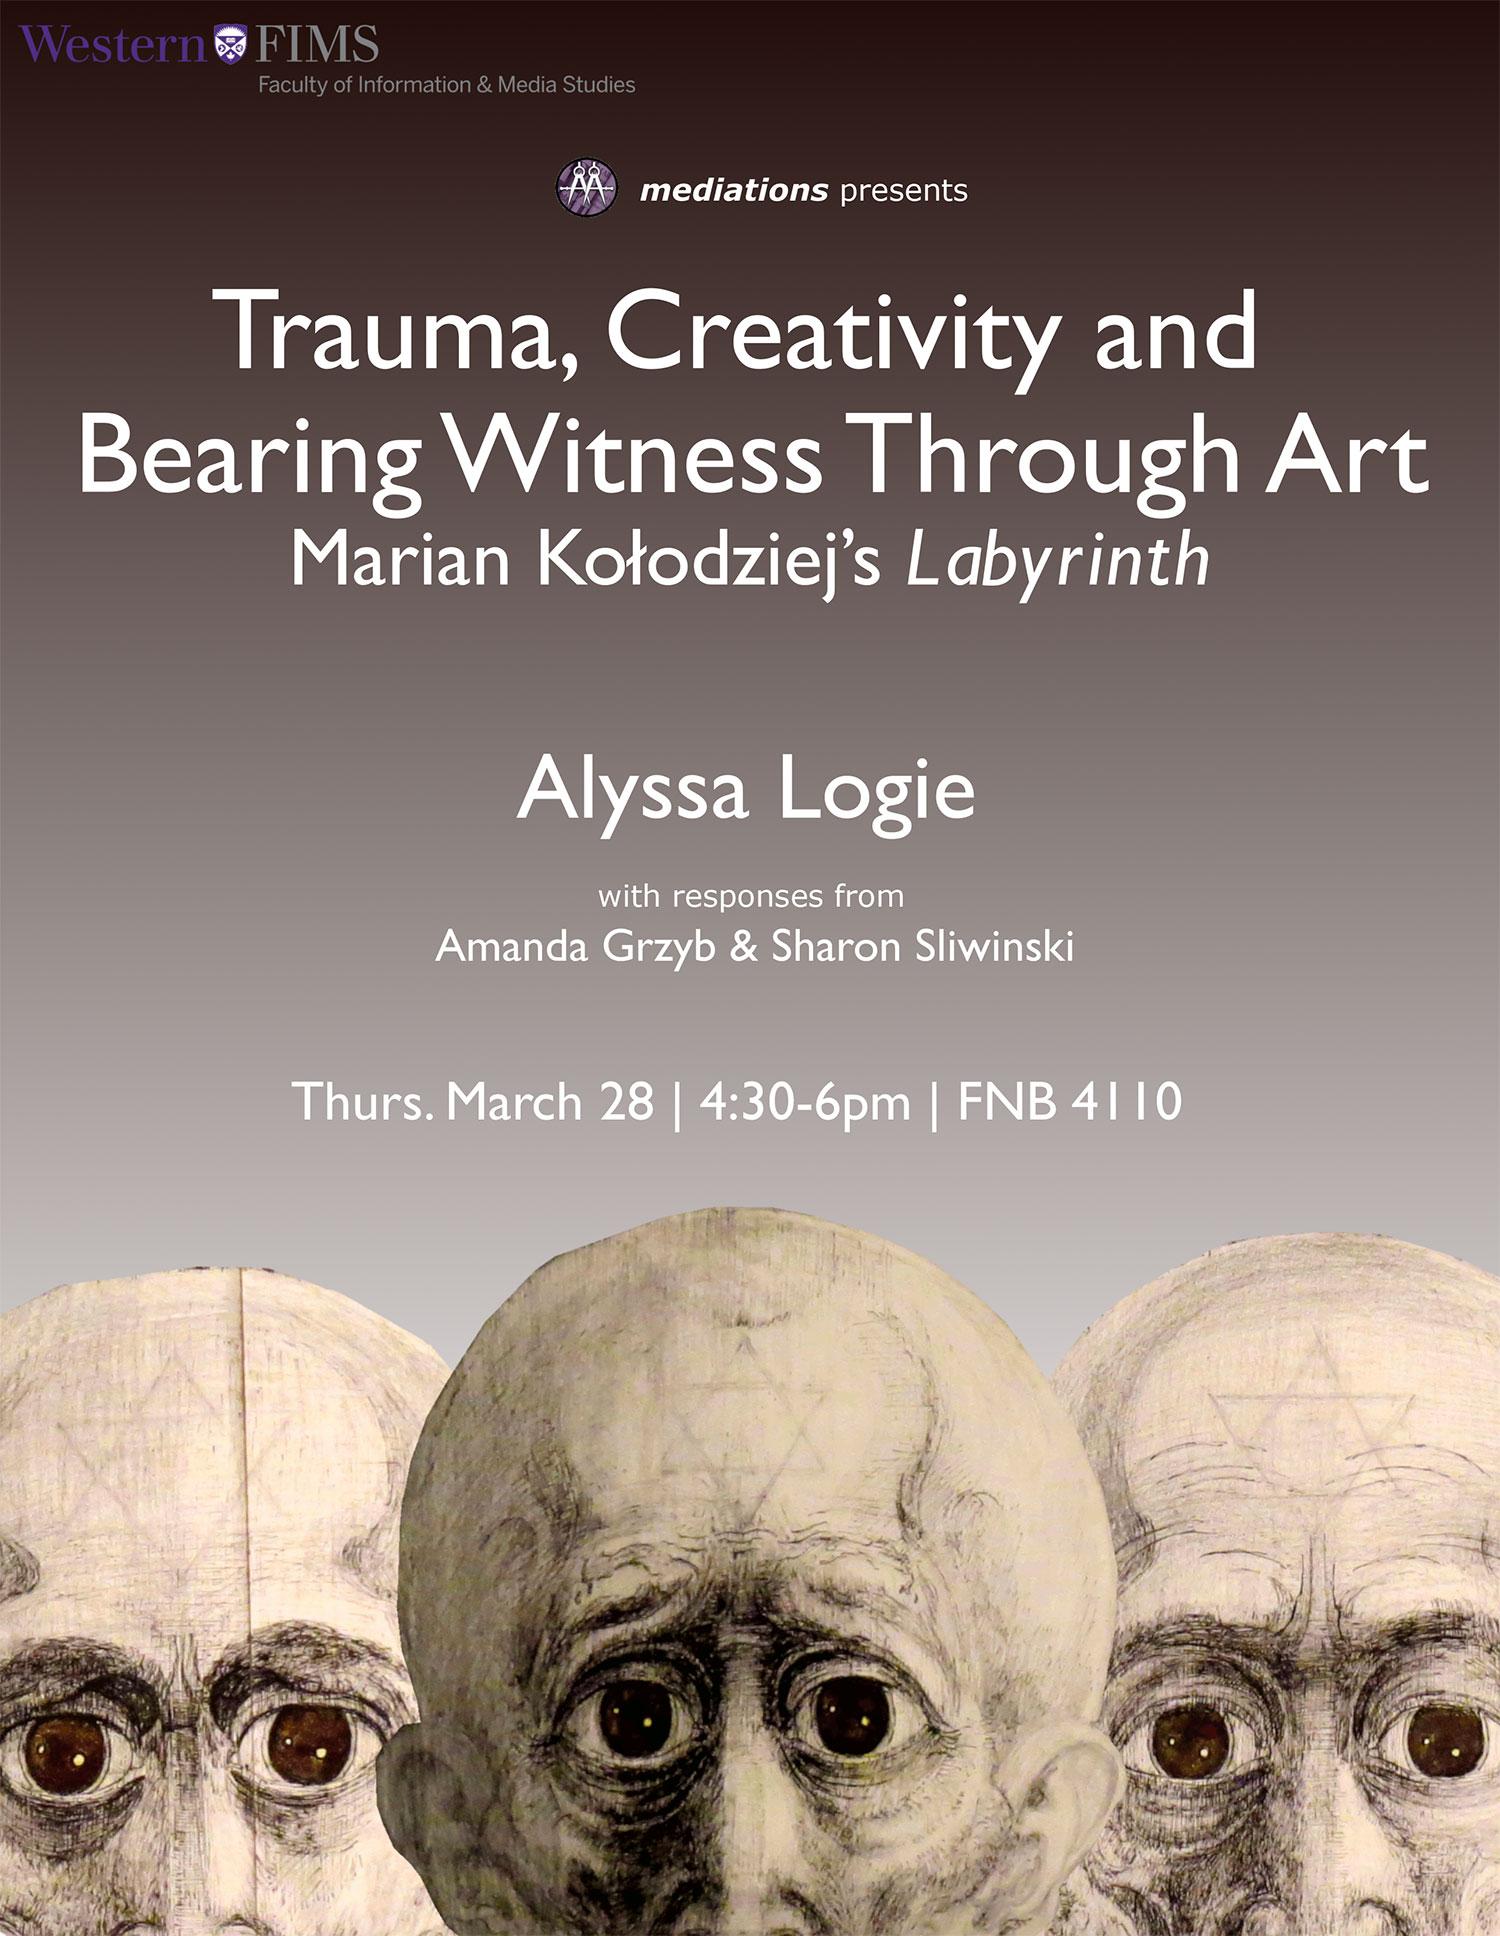 Trauma, Creativity and Bearing Witness Through Art